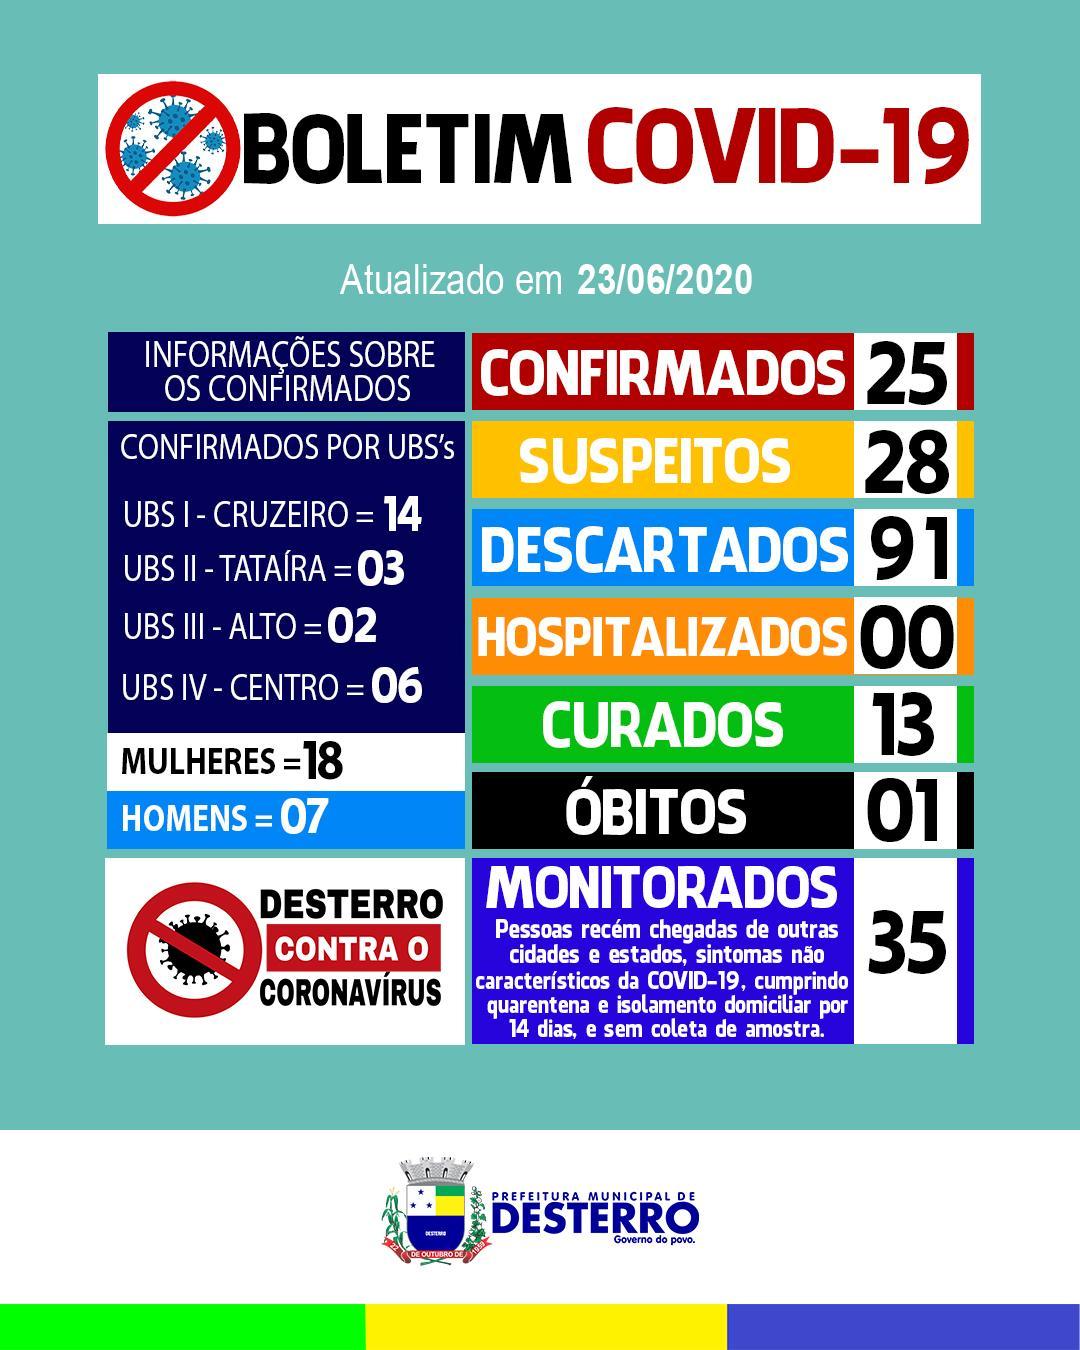 Boletim Covid-19 (23/06/2020)